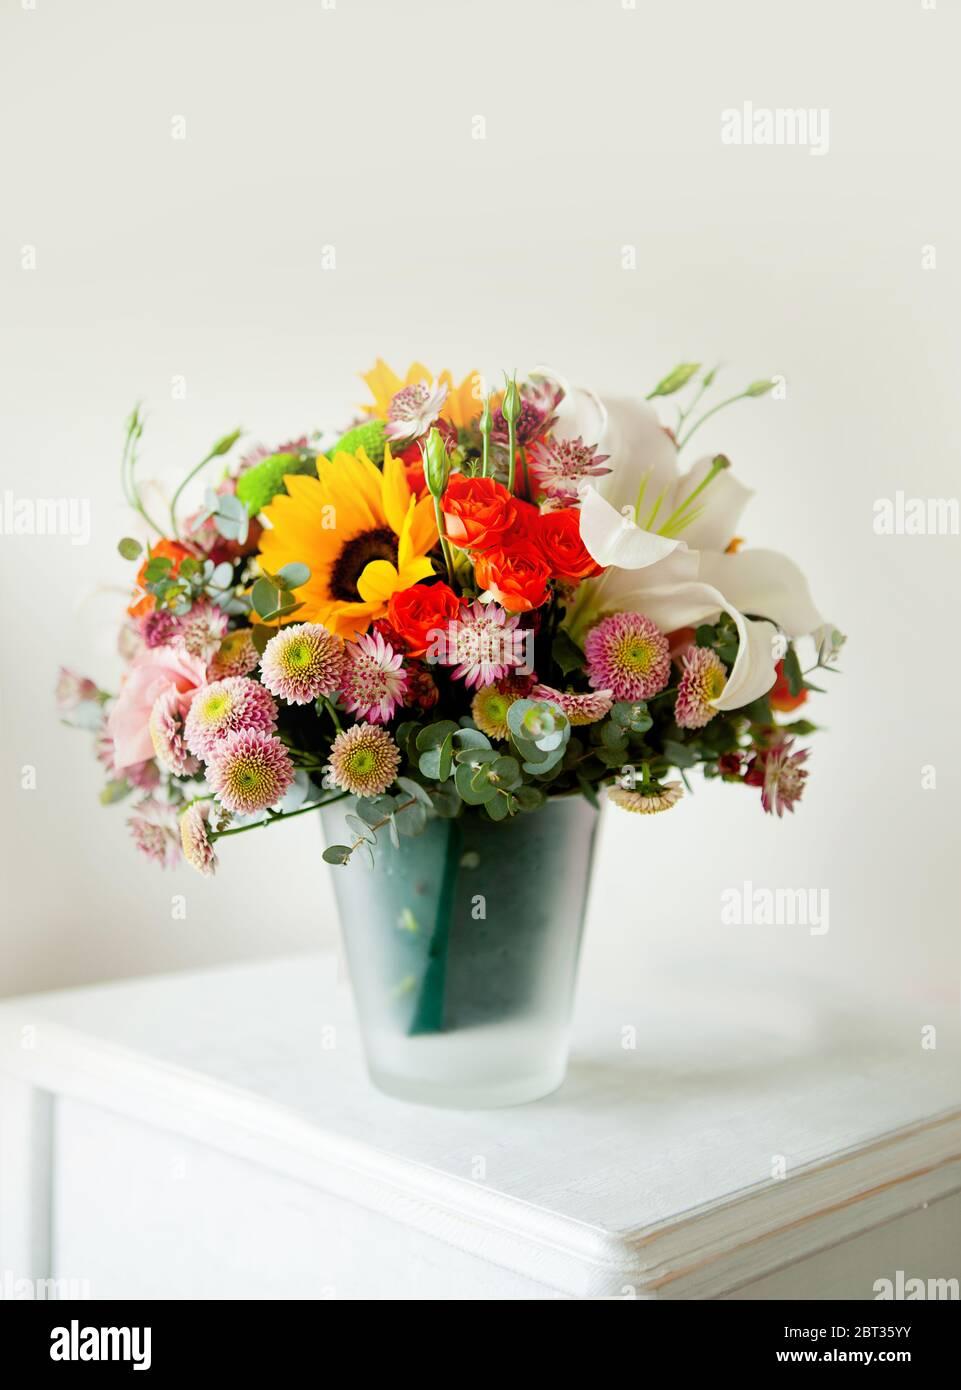 Floral Bouquet With Lily Sunflower Chrysanthemum Eustoma Lisianthus Astrantsiya Eucalyptus Shrub Rose Stock Photo Alamy